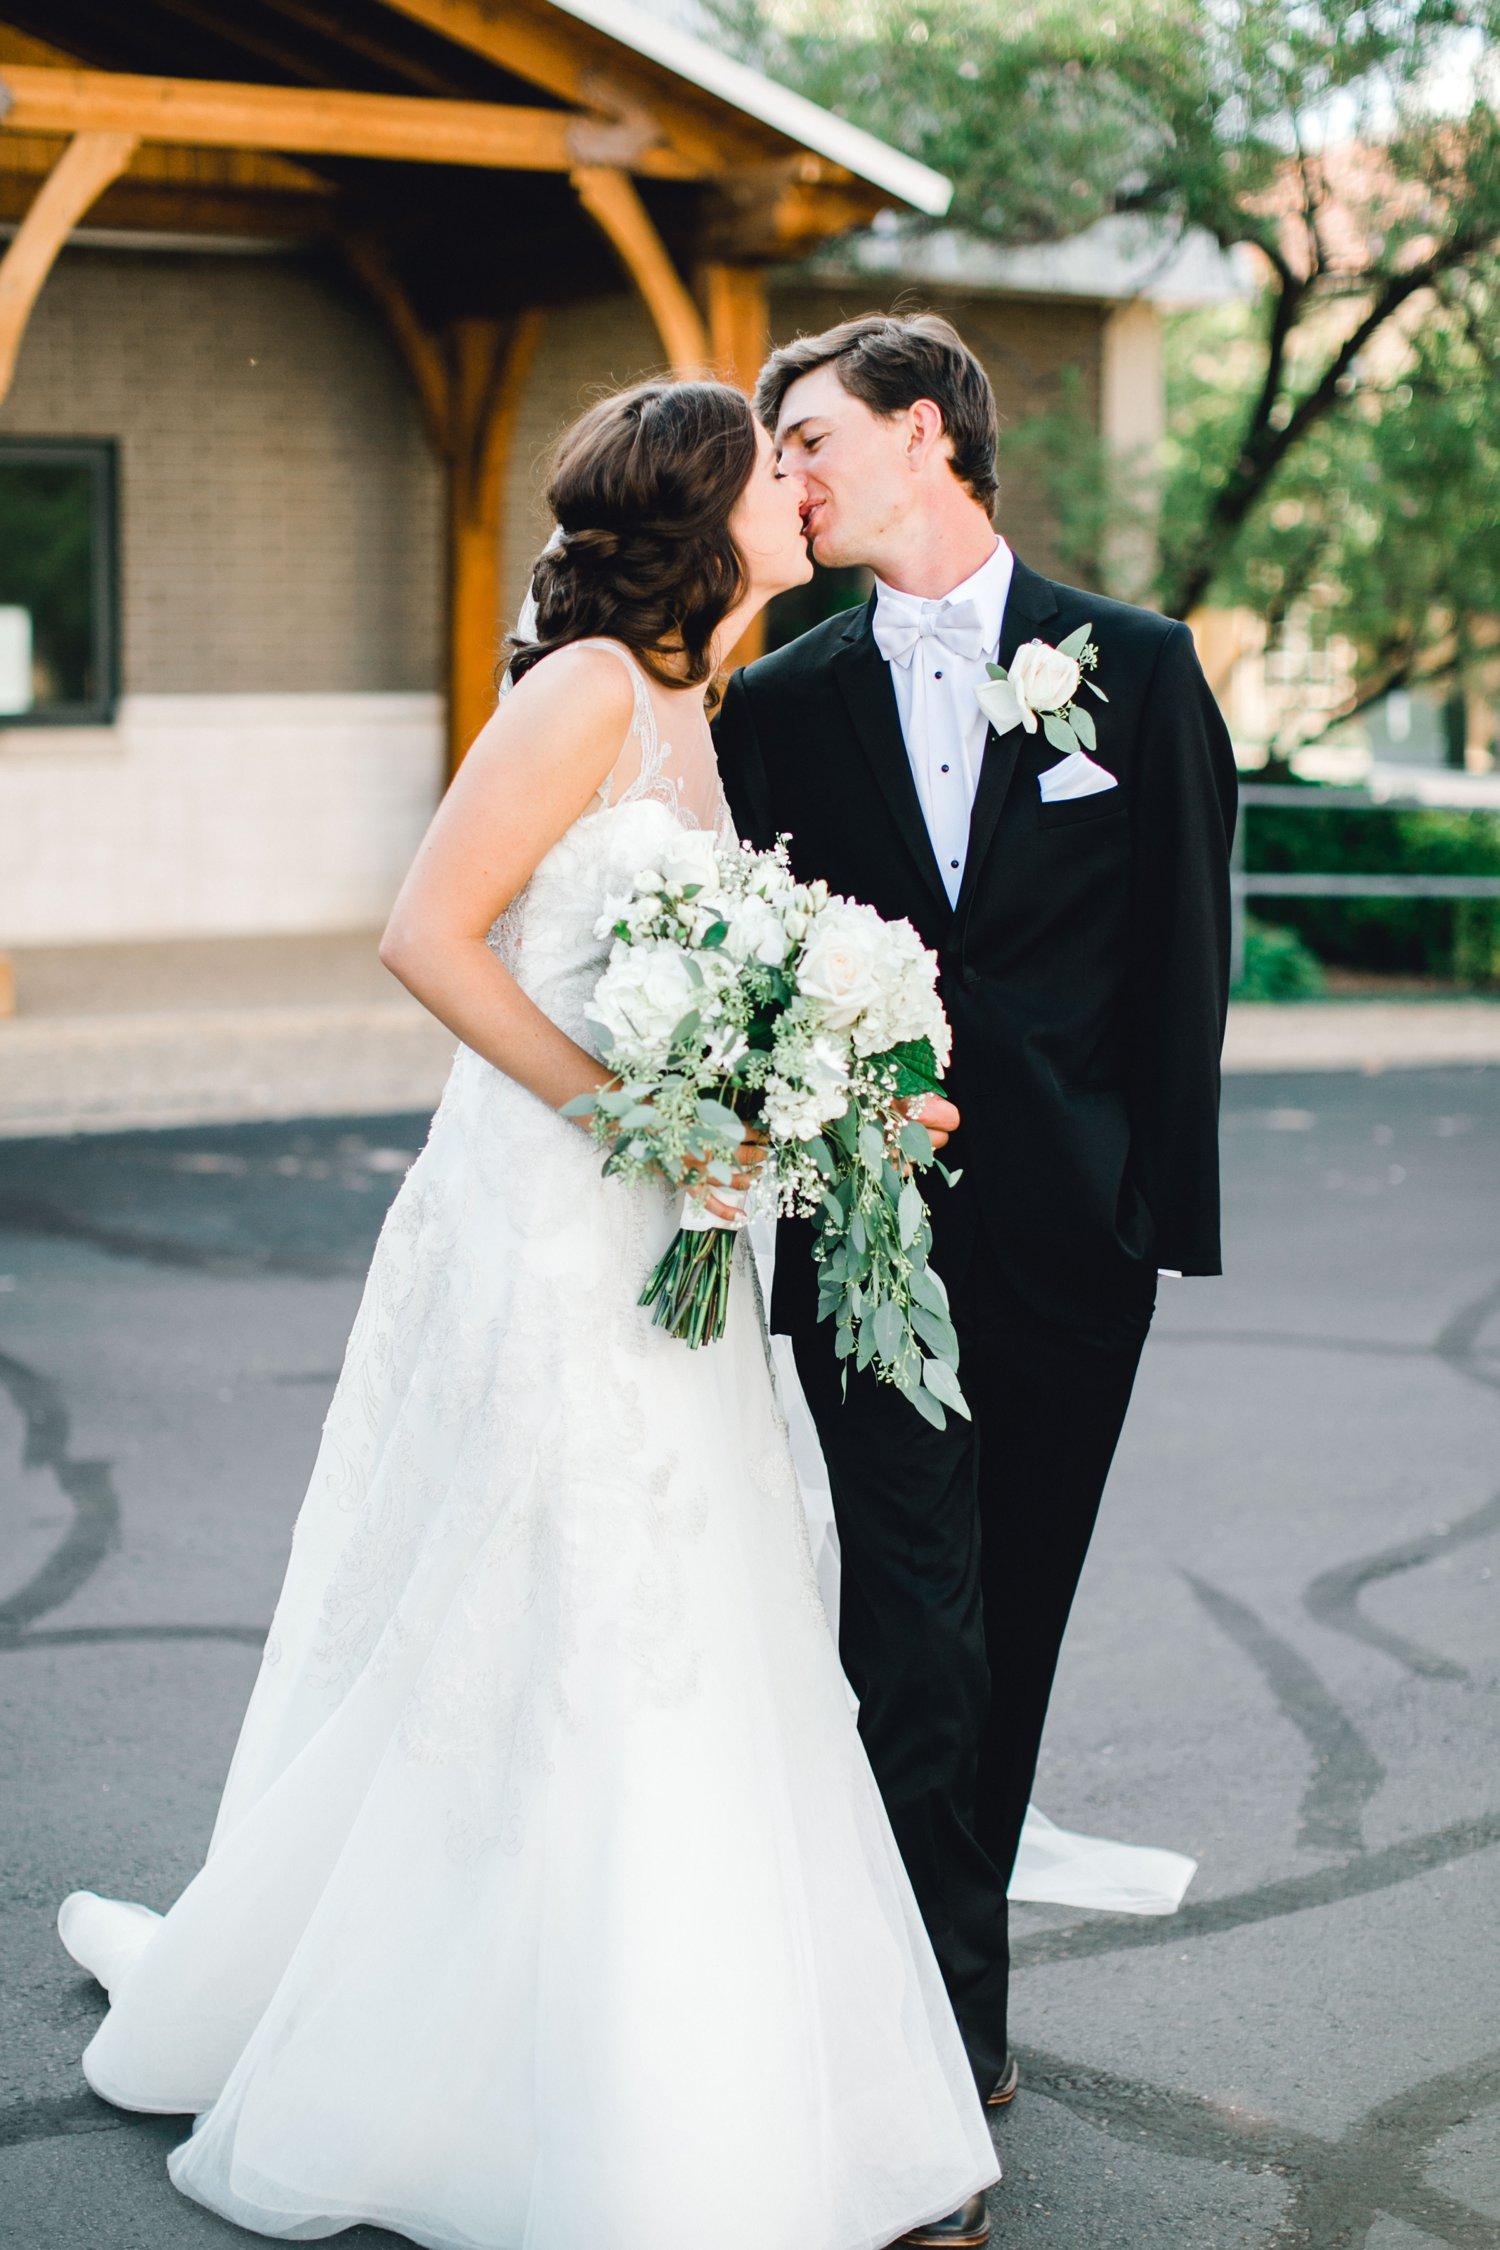 Hunter_and_Molly_Rawls_ALLEEJ_Lubbock_WEDDING_Legacy_Event_Center_0144.jpg